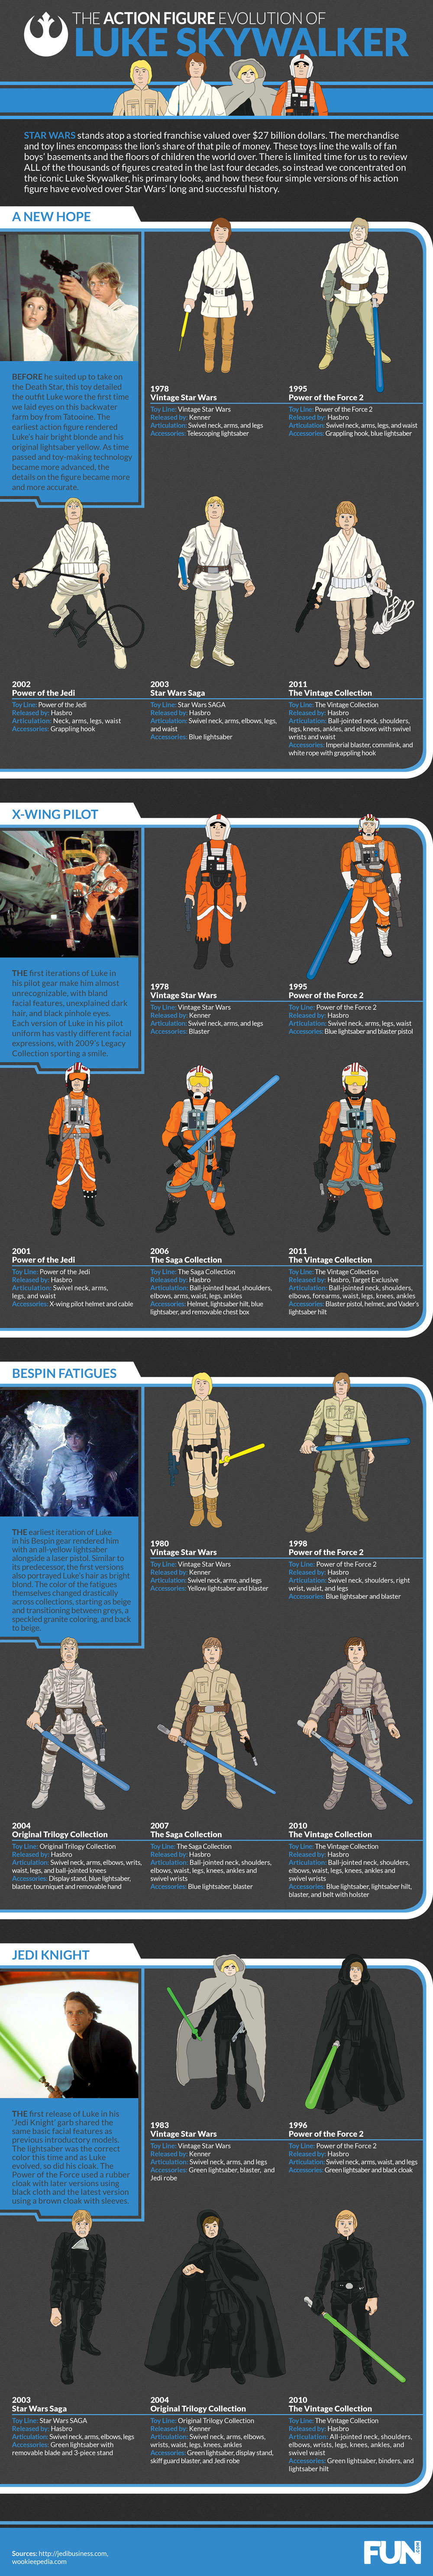 Evolution of Luke Skywalker Action Figure Infographic